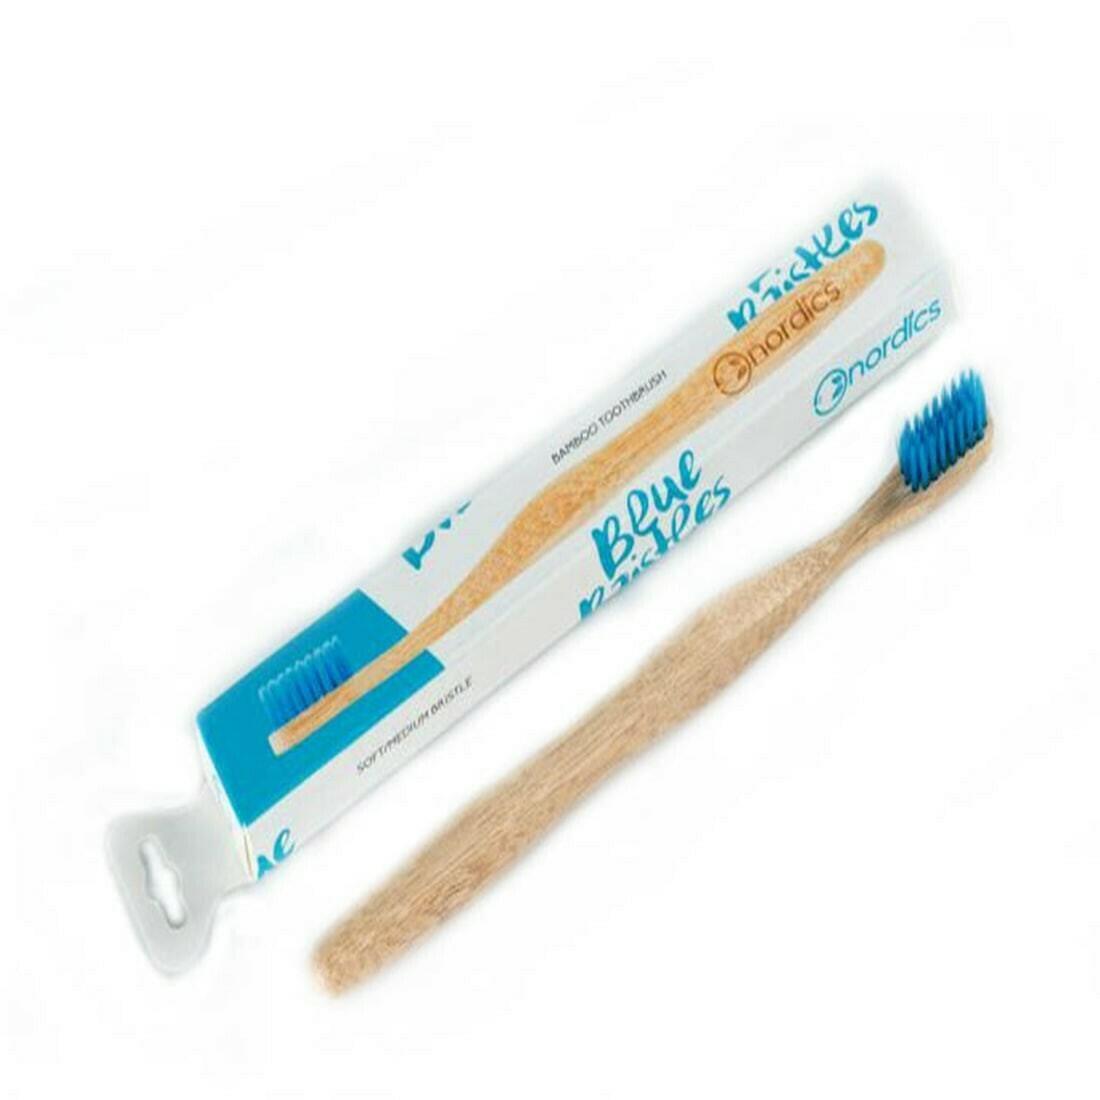 Nordics Bamboo Οδοντόβουρτσα Μπλέ